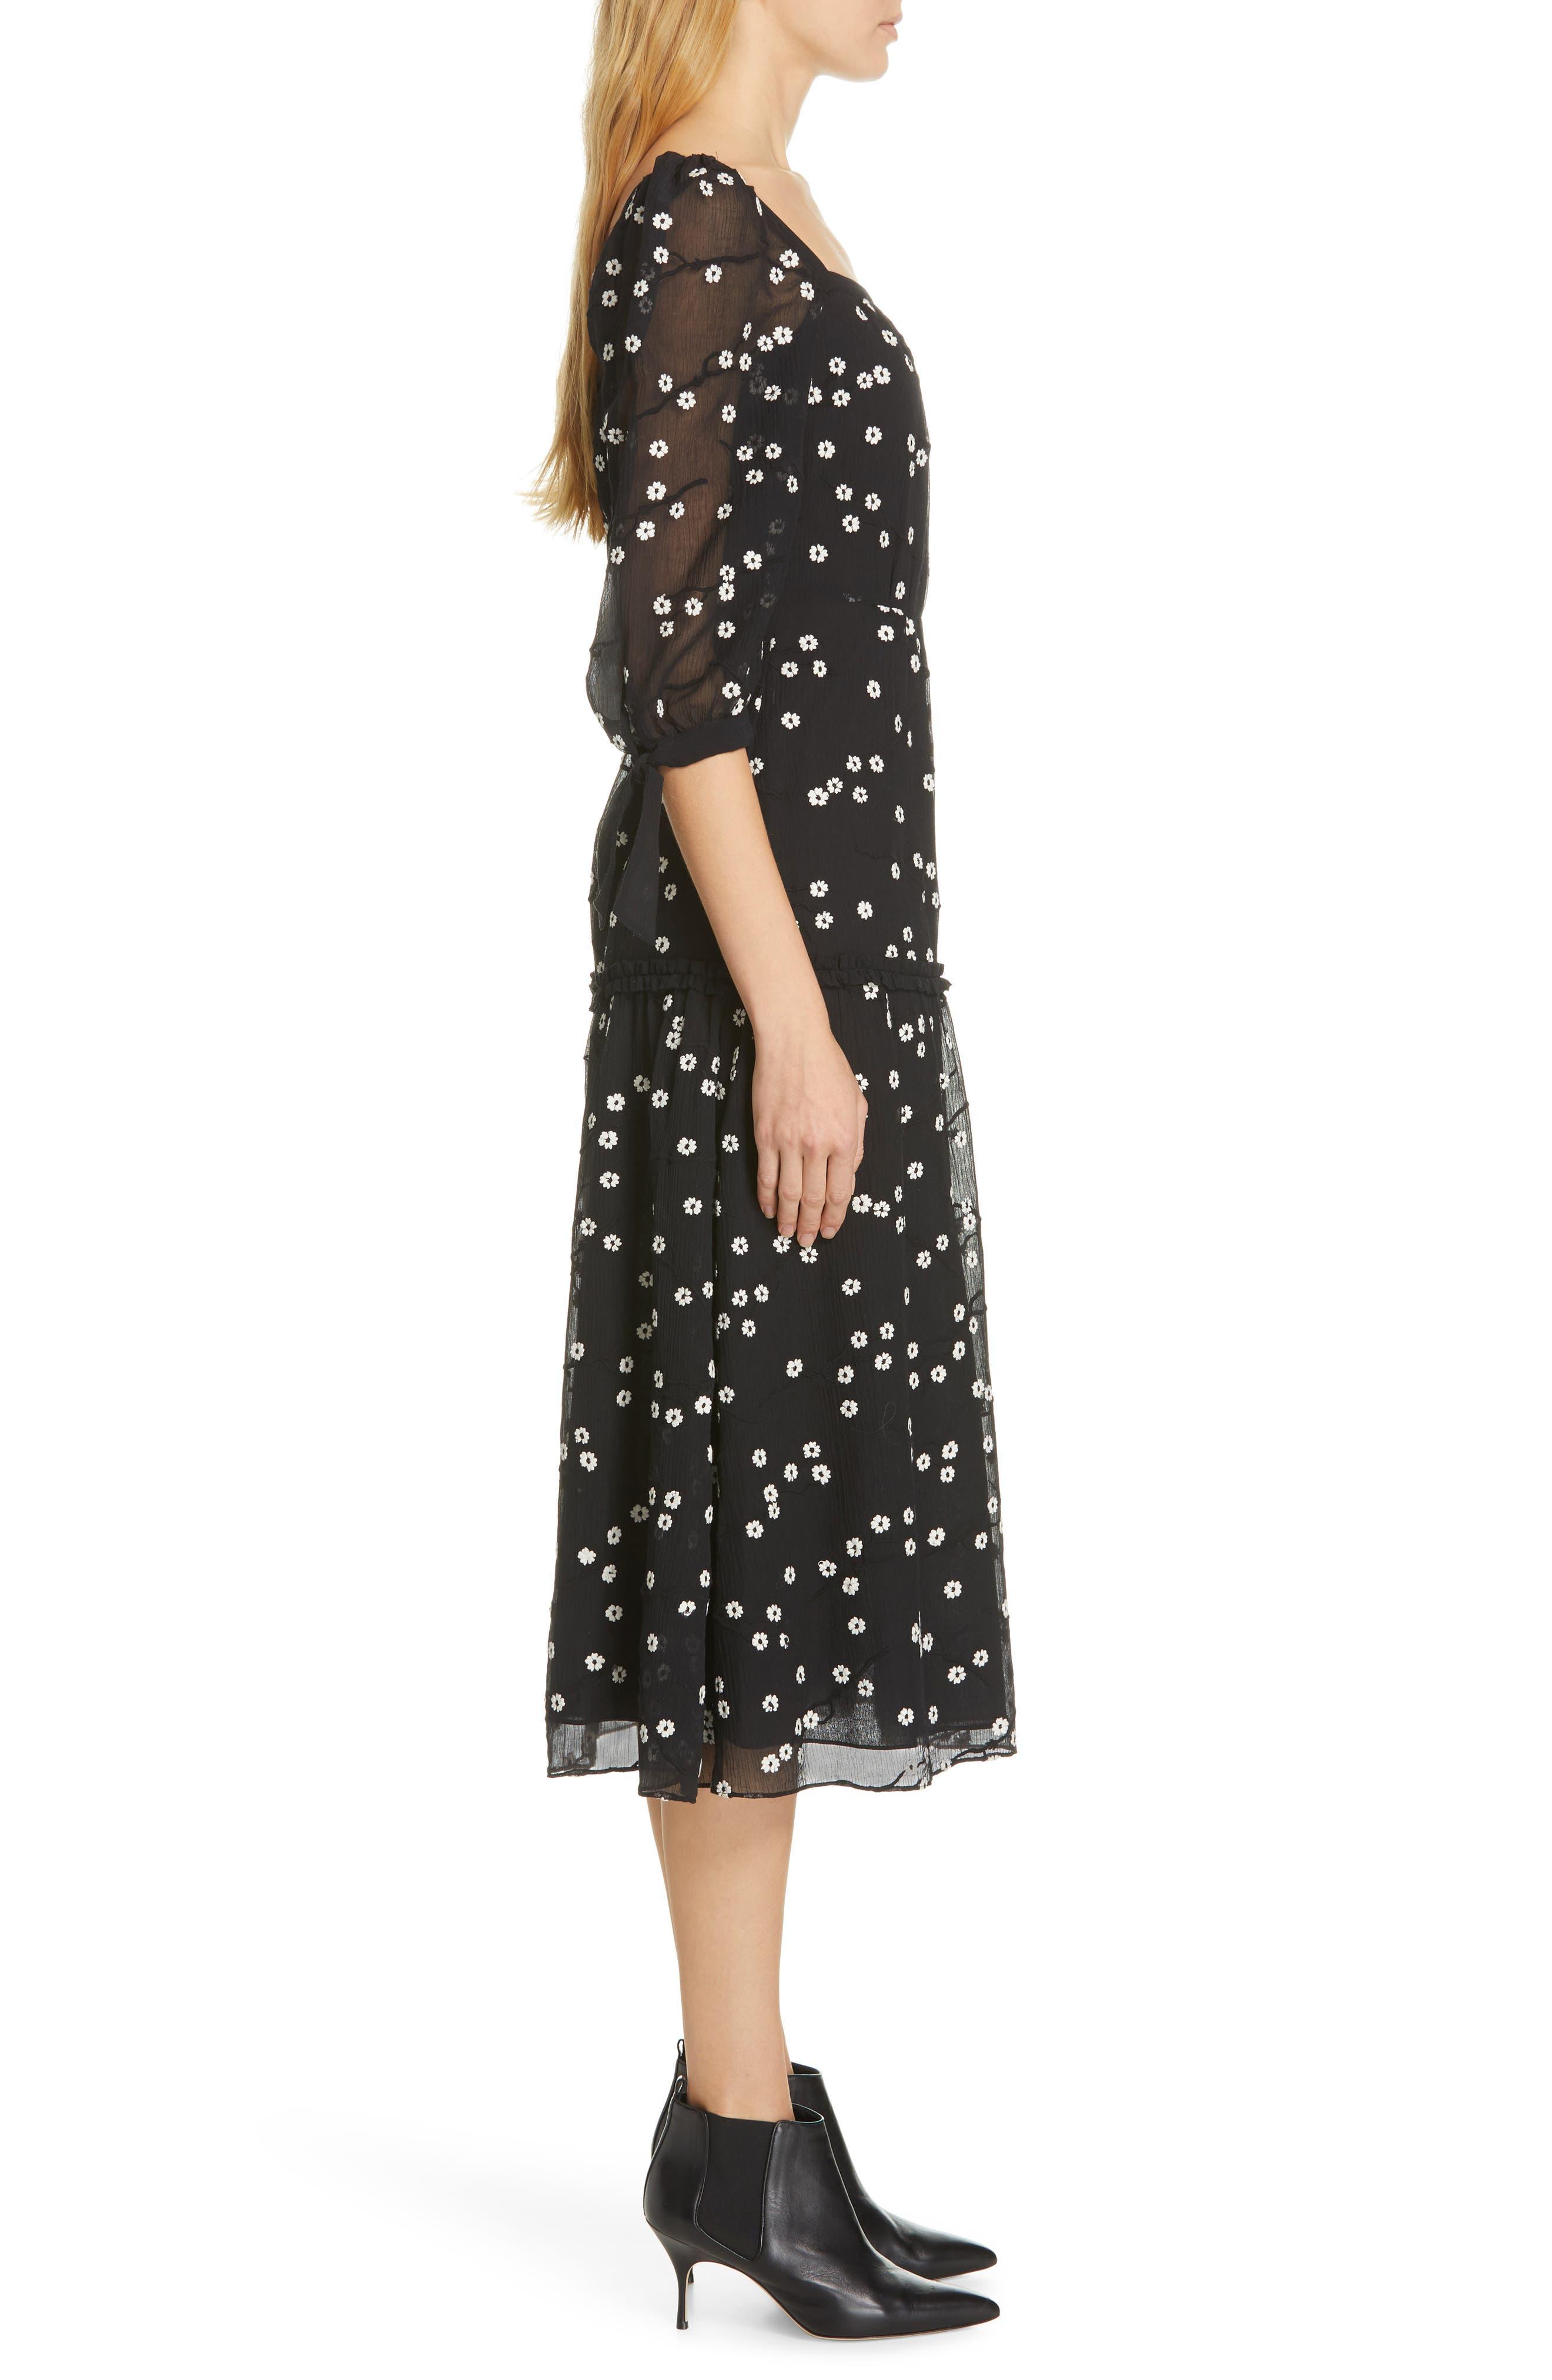 REBECCA TAYLOR, Allessandra Midi Dress, Alternate thumbnail 4, color, BLACK COMBO